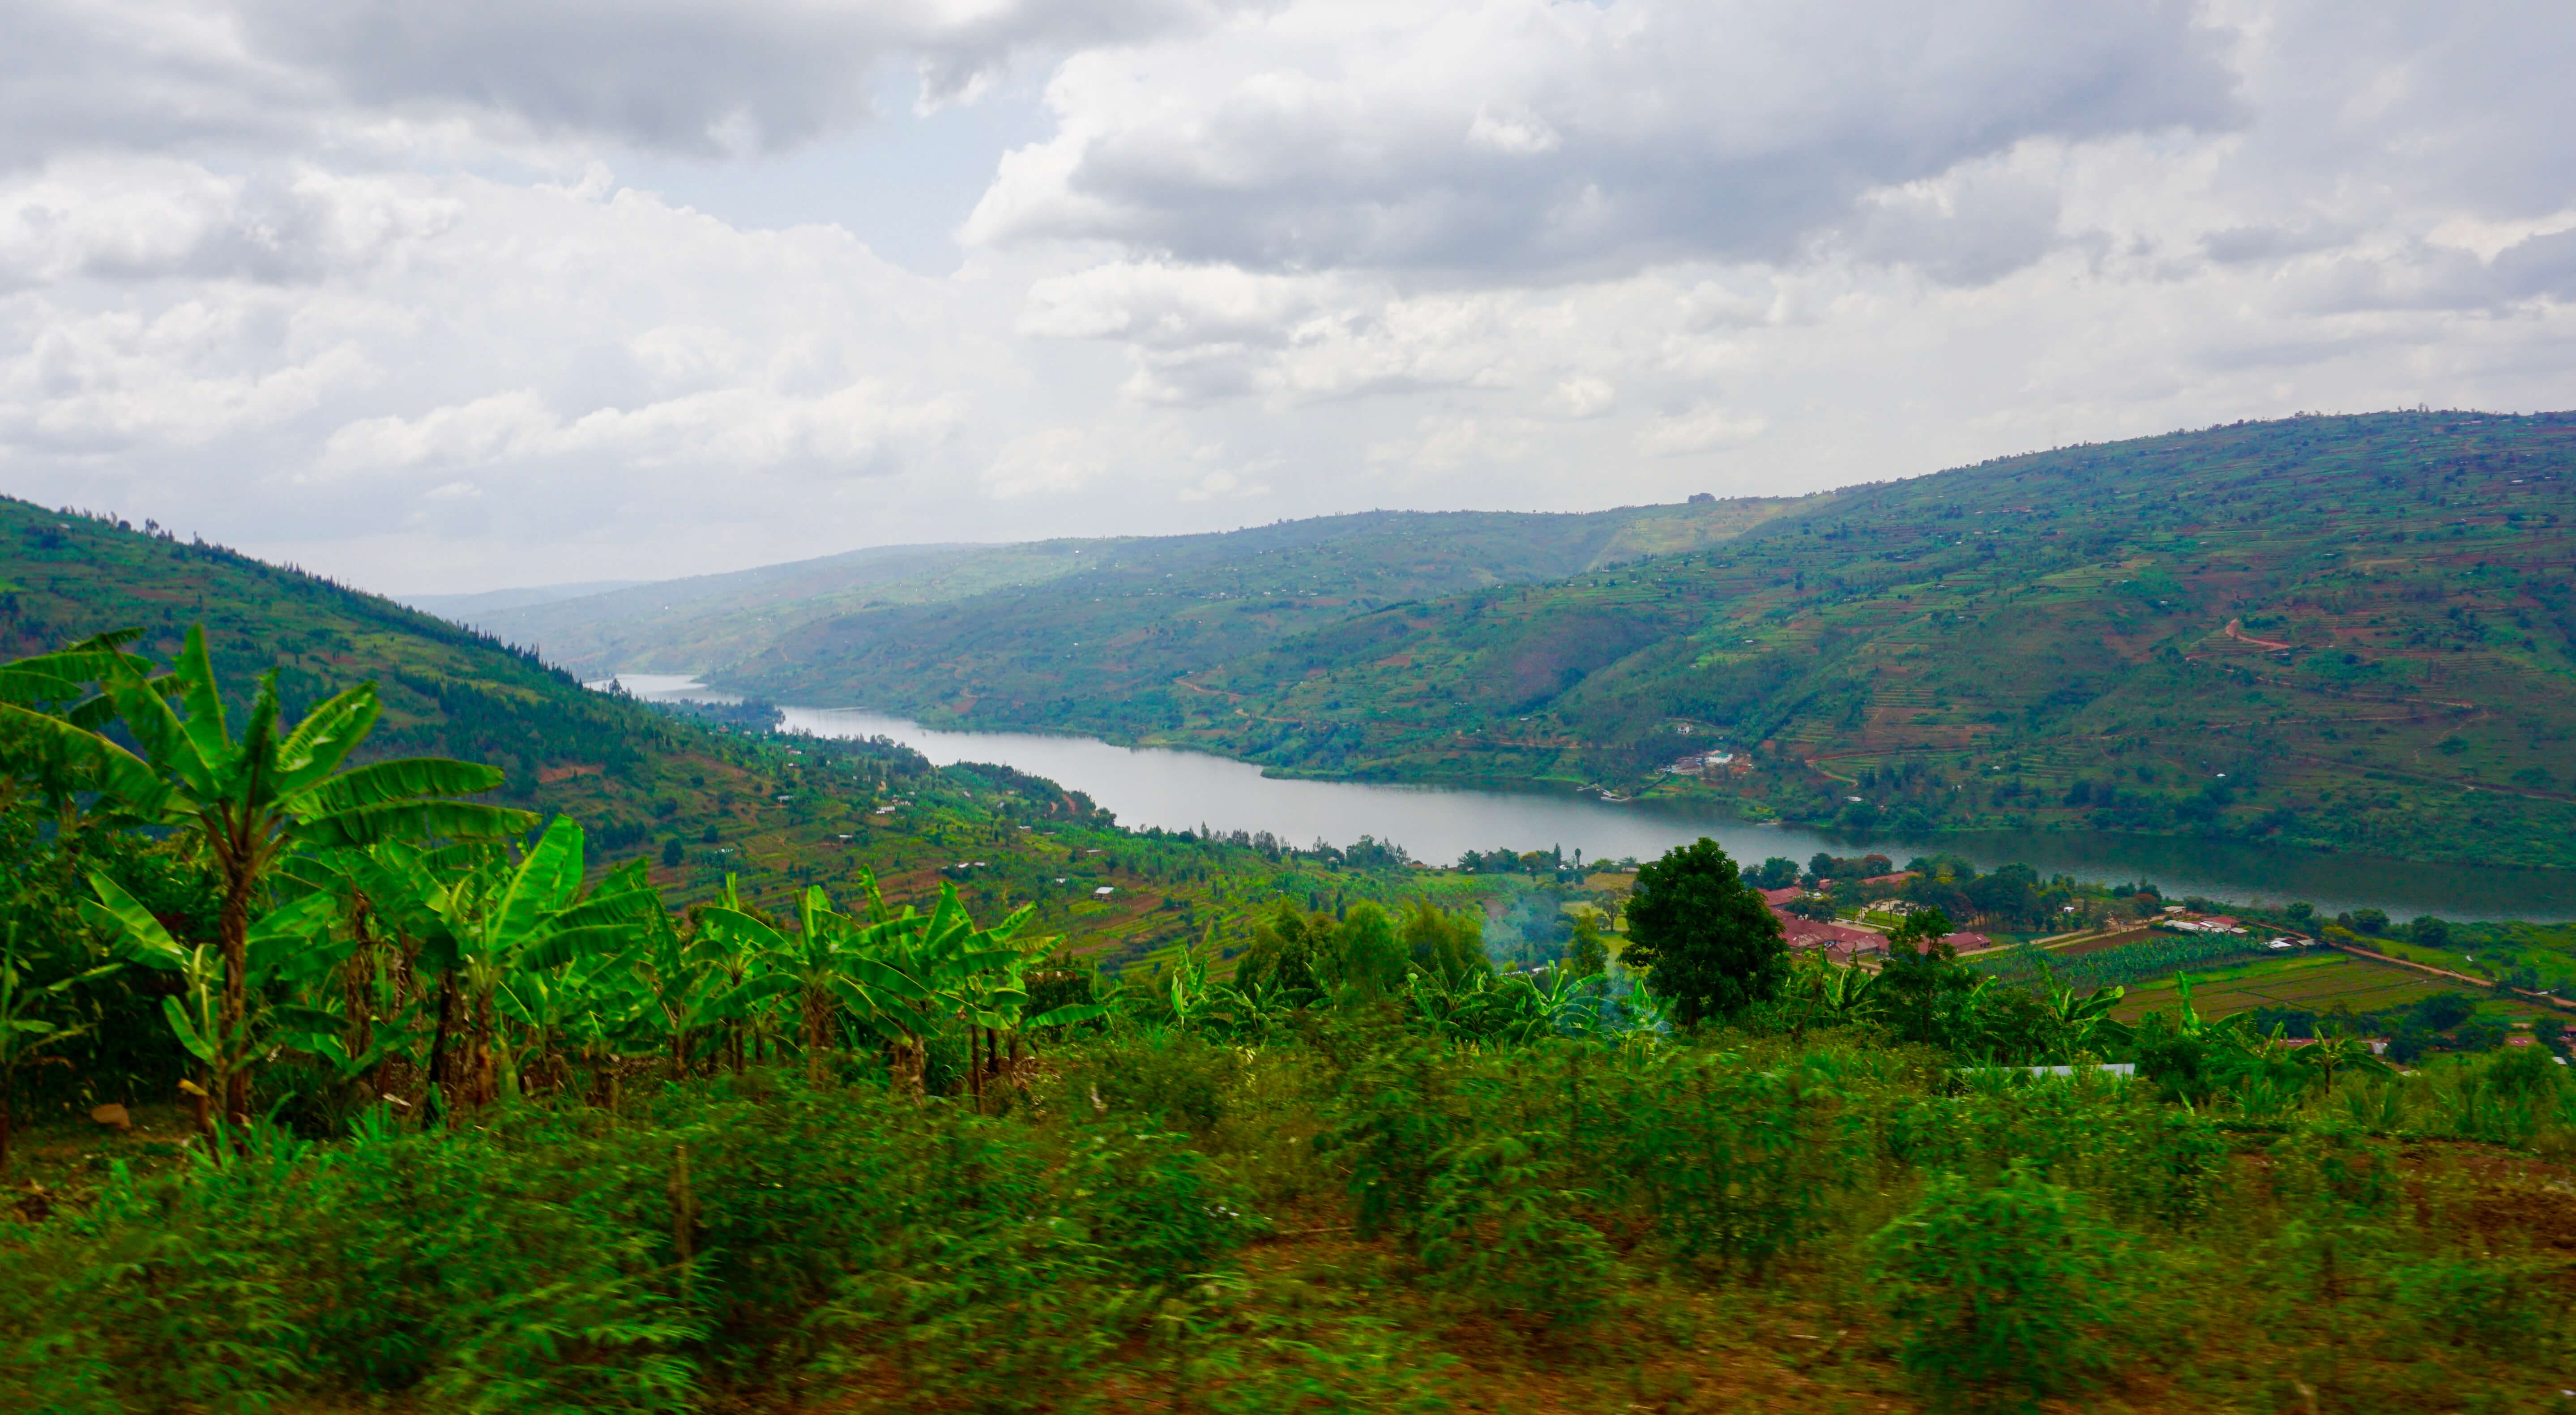 View of the Rwandan countryside